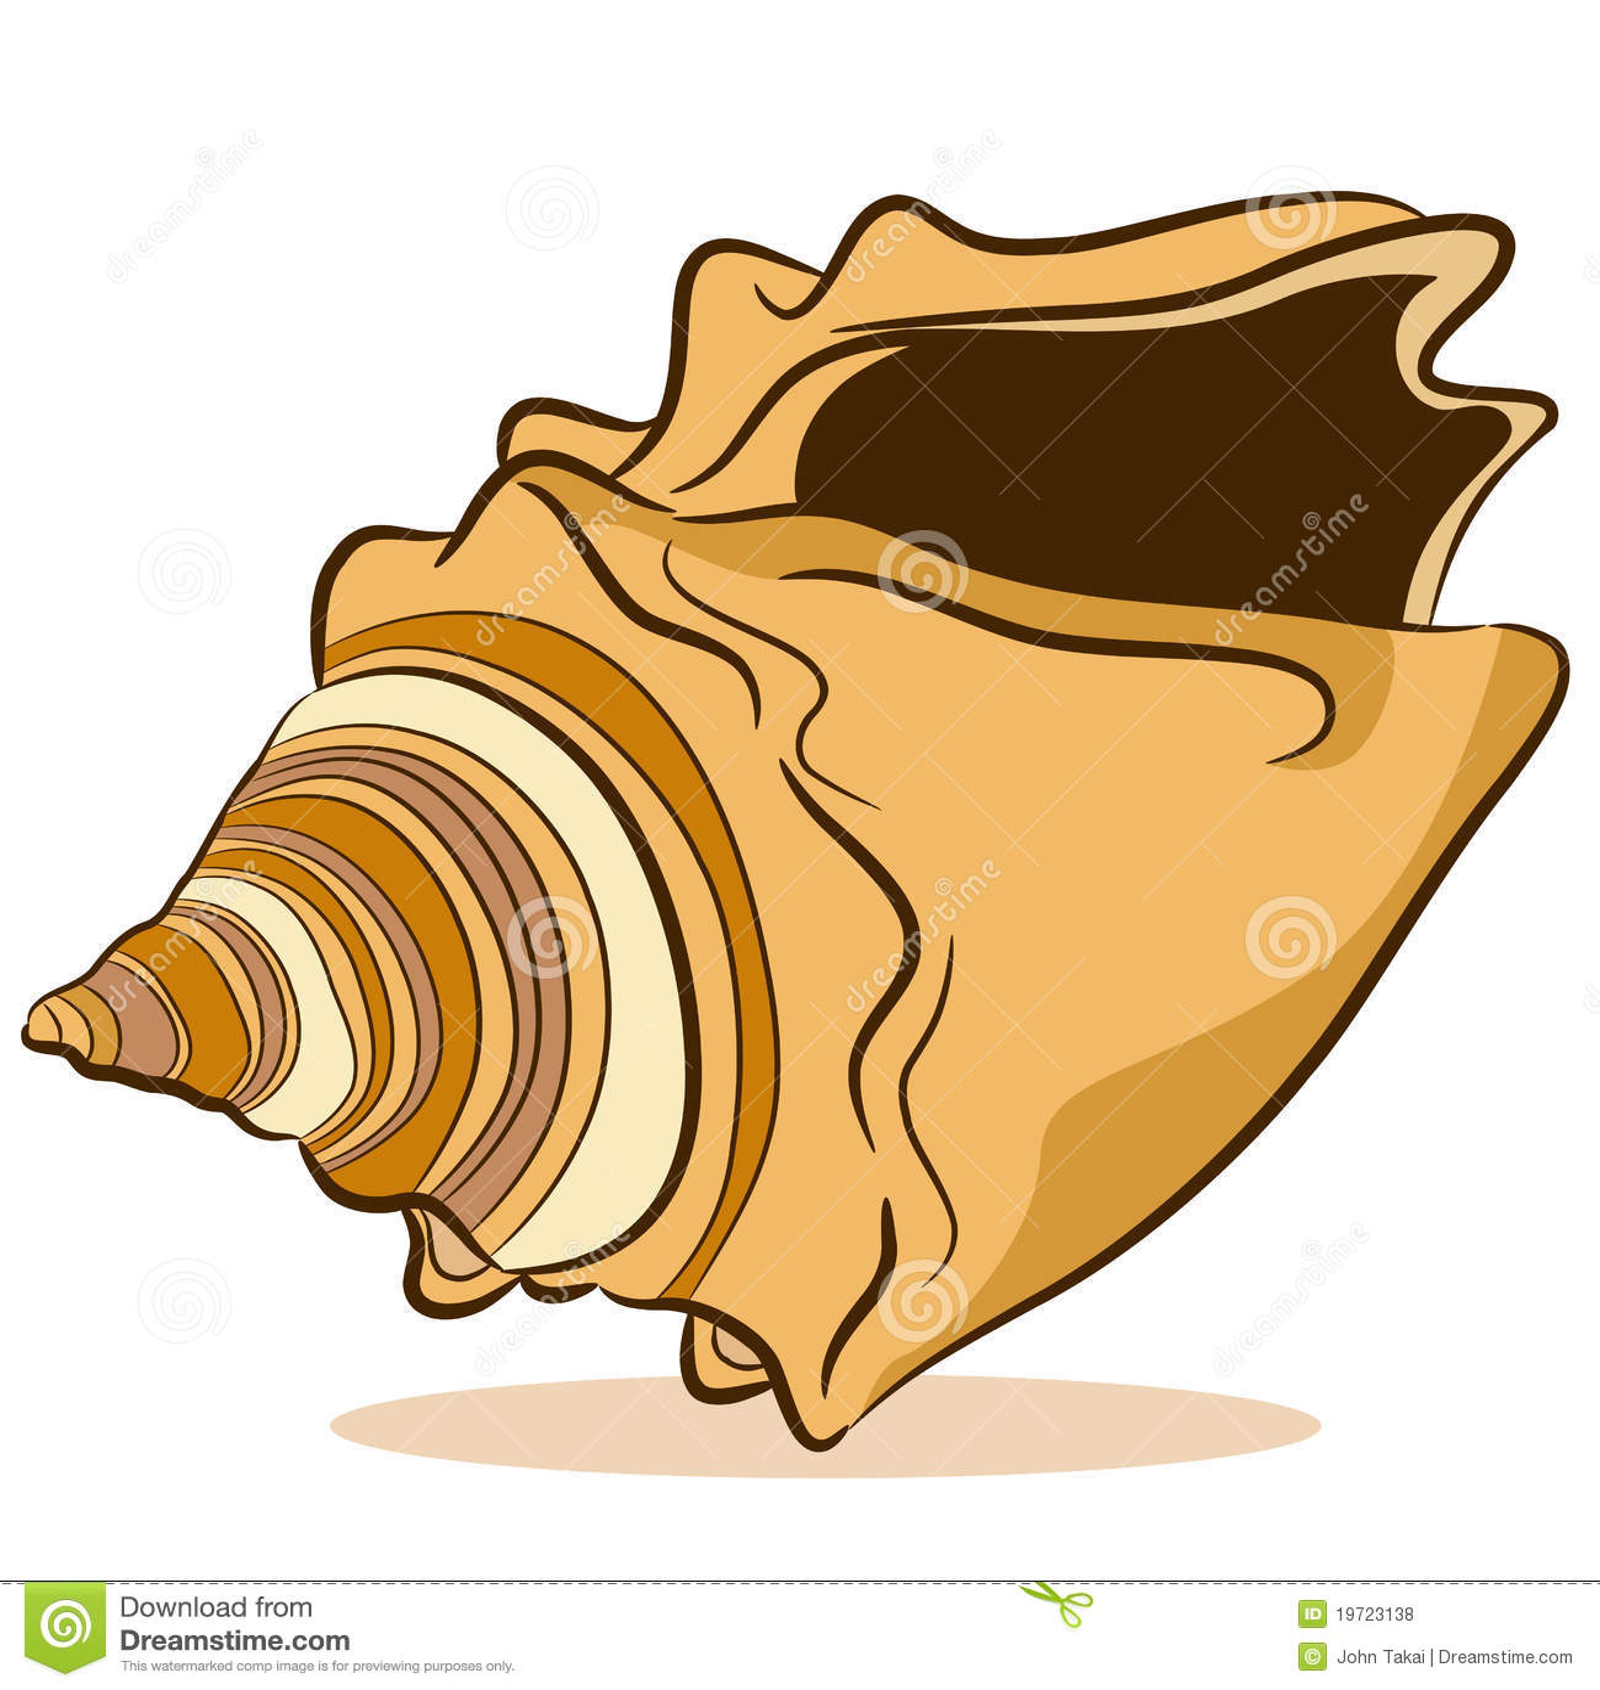 Seashell Drawing Royalty Free Stock Photos - Image: 19723138